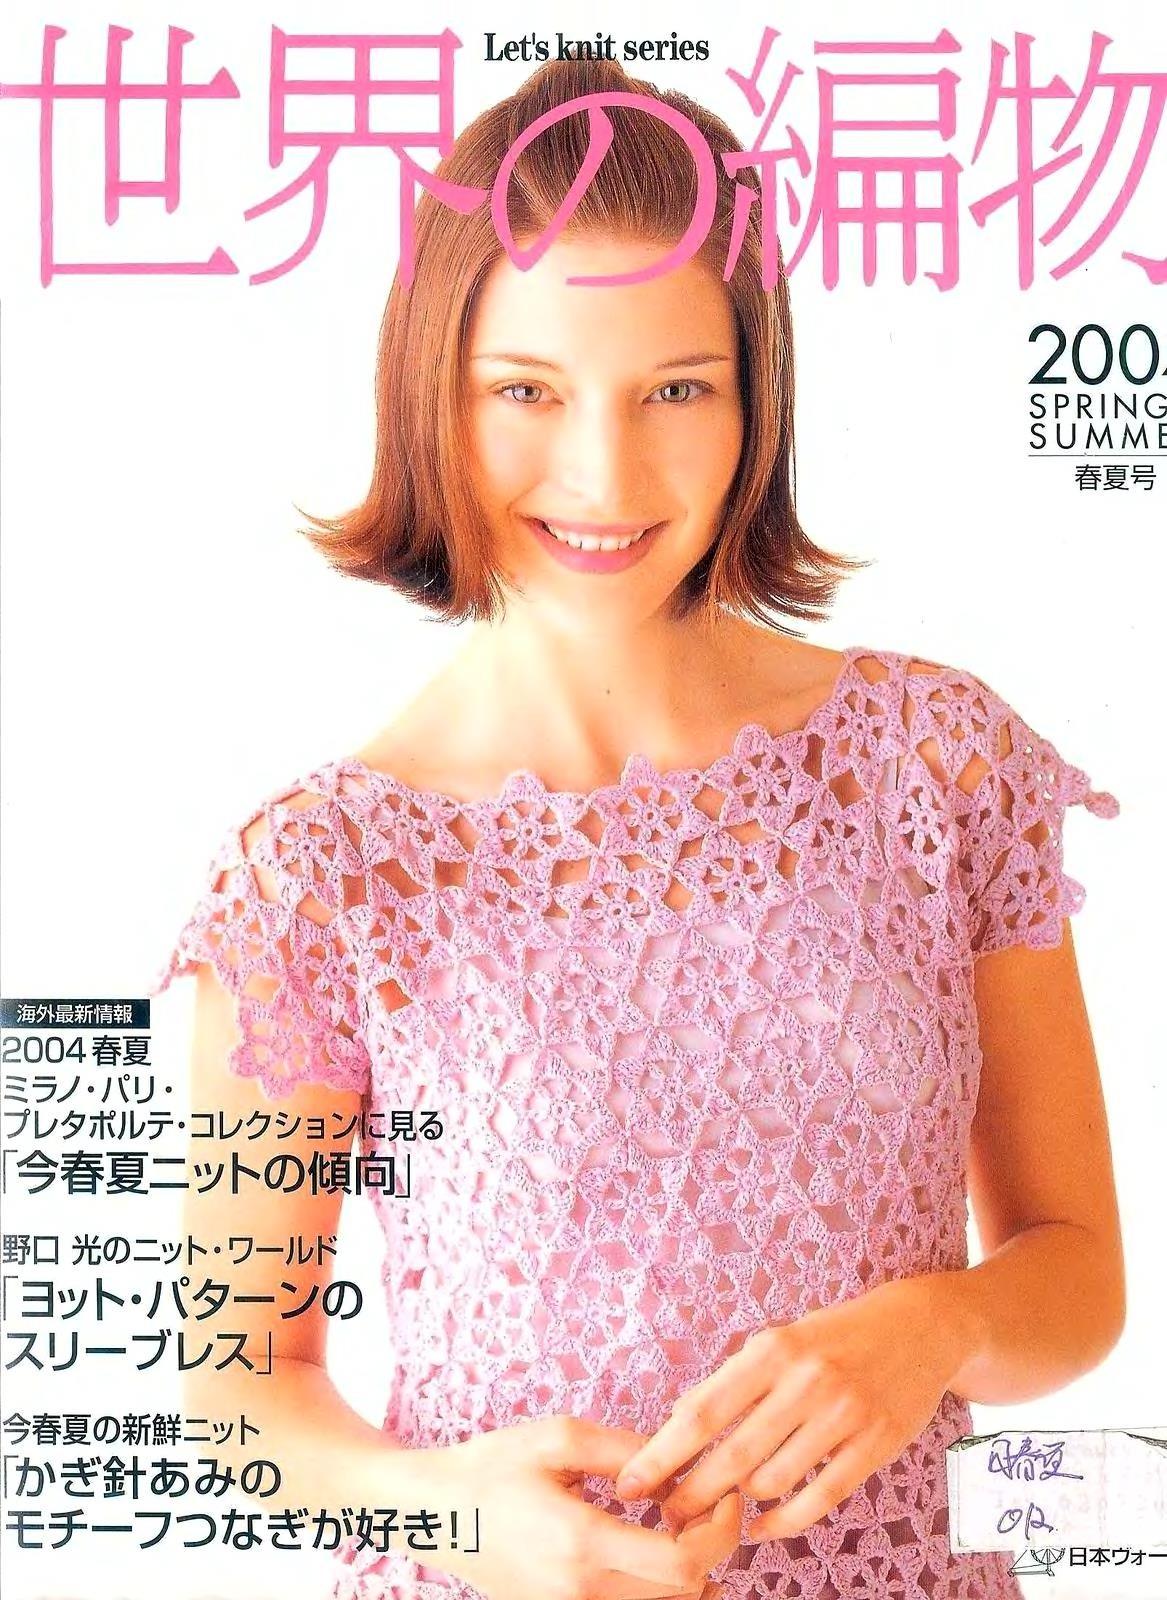 Lets-knit-series-2004-springsummer-sp-kr_1.jpg